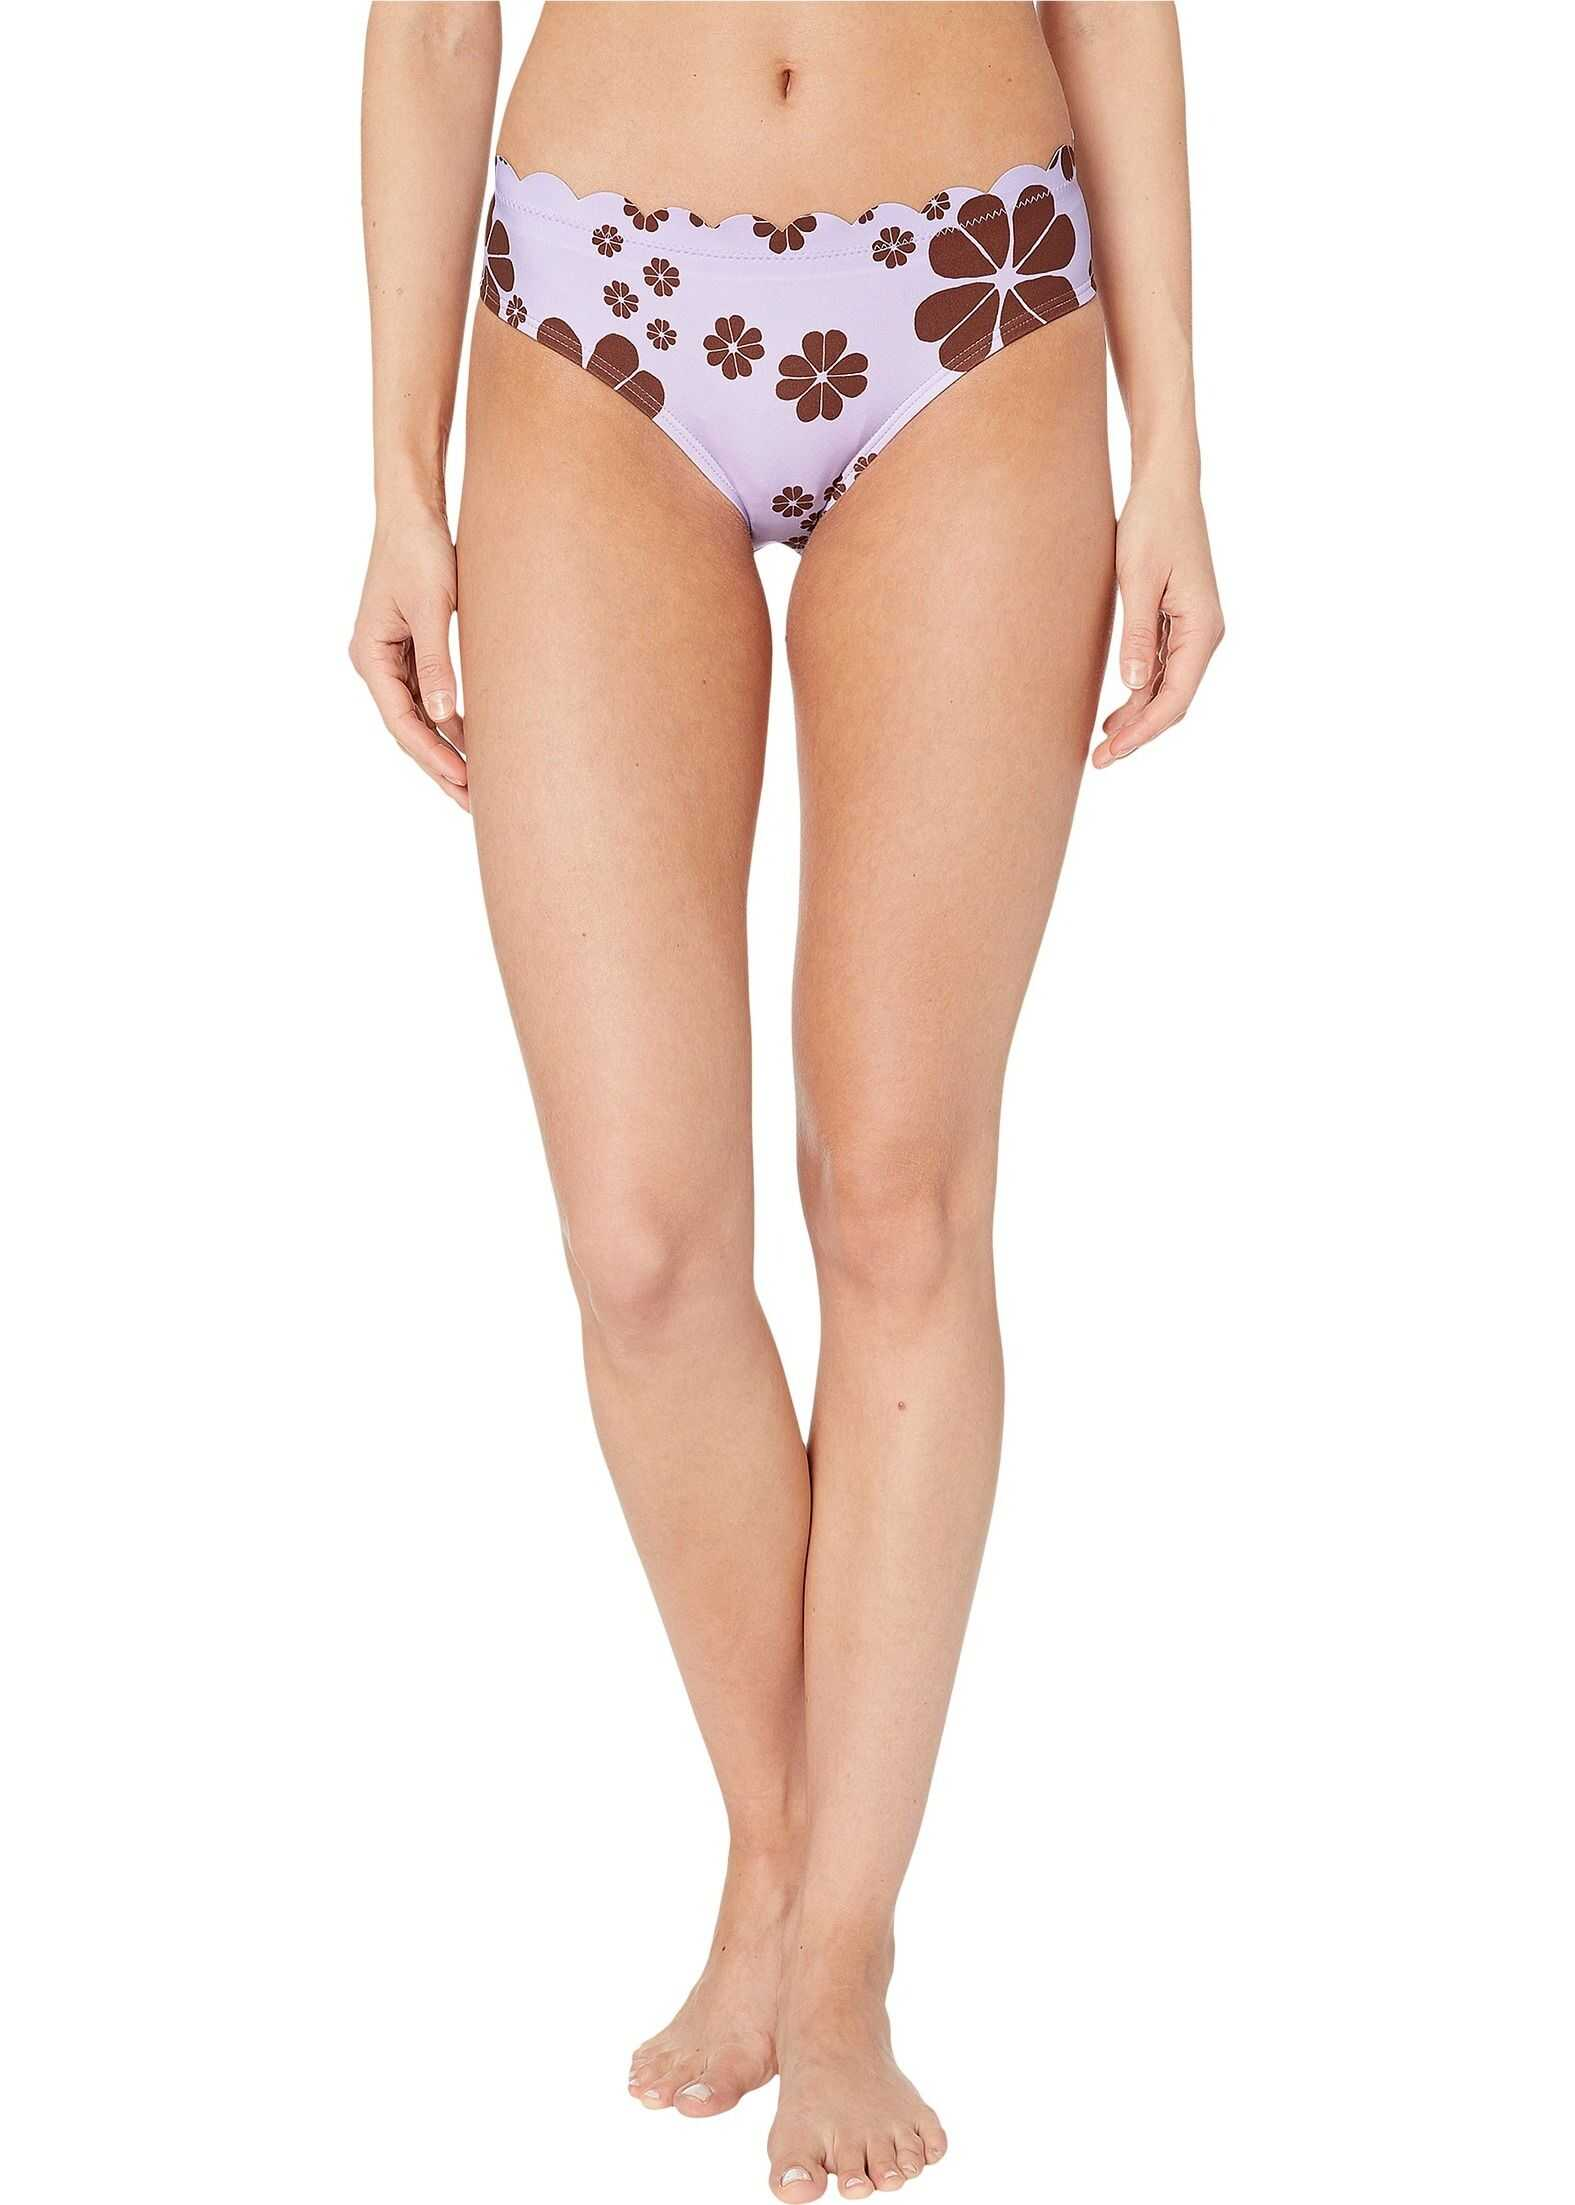 Kate Spade New York Scalloped Hipster Bikini Bottoms Frozen Lilac